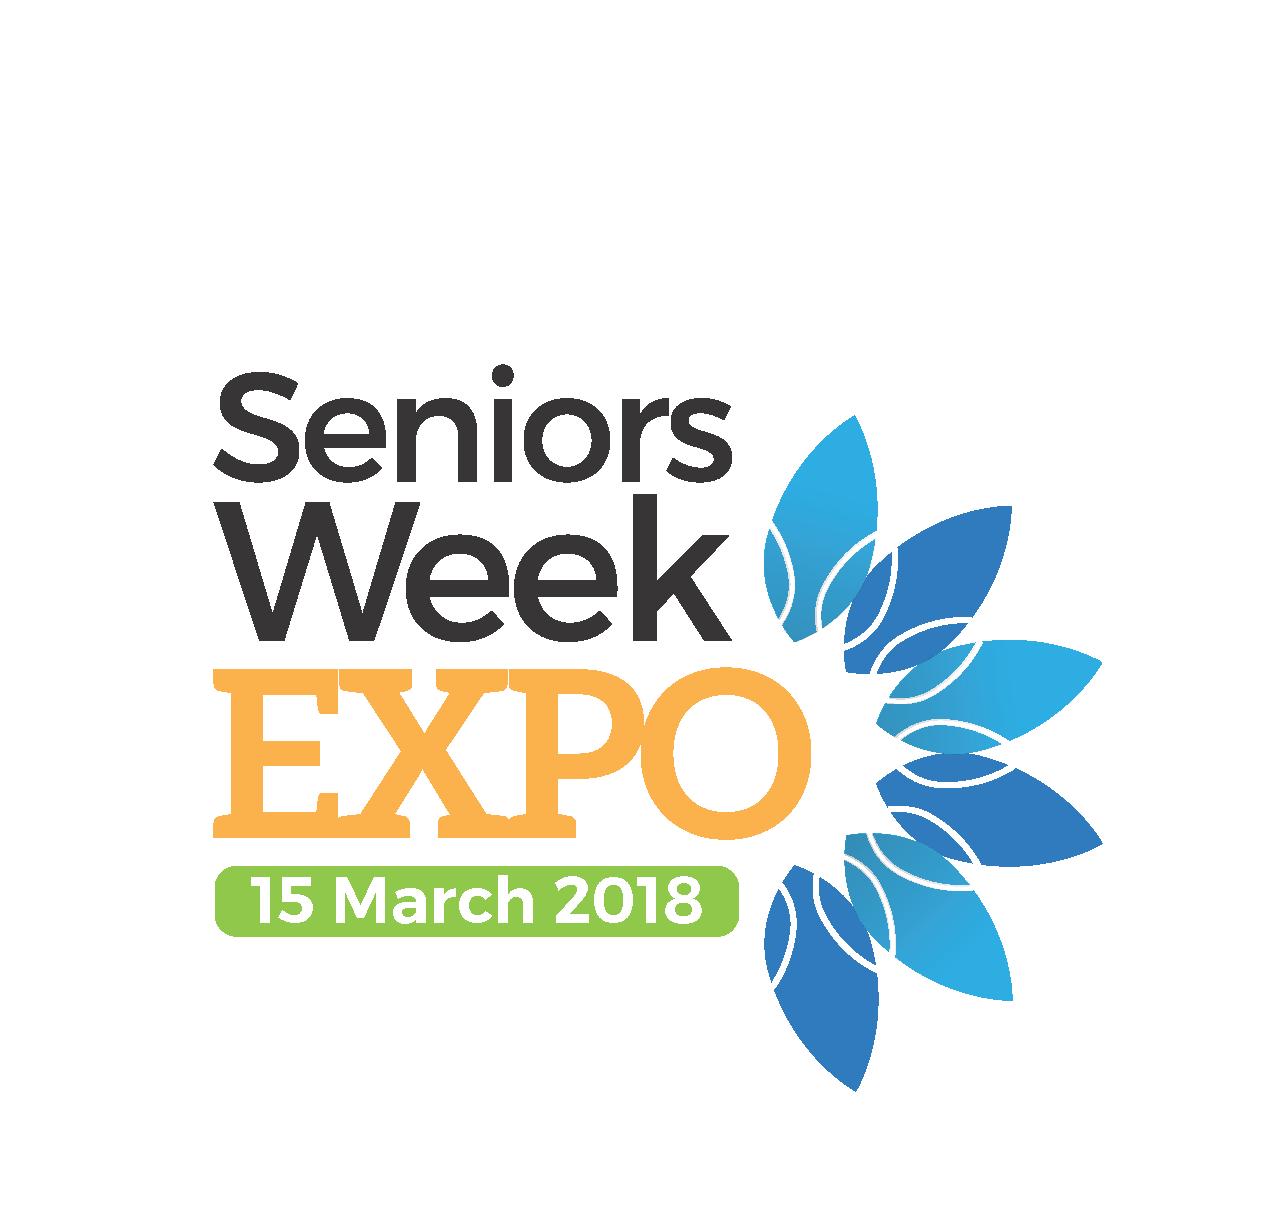 Seniors Expo 2018